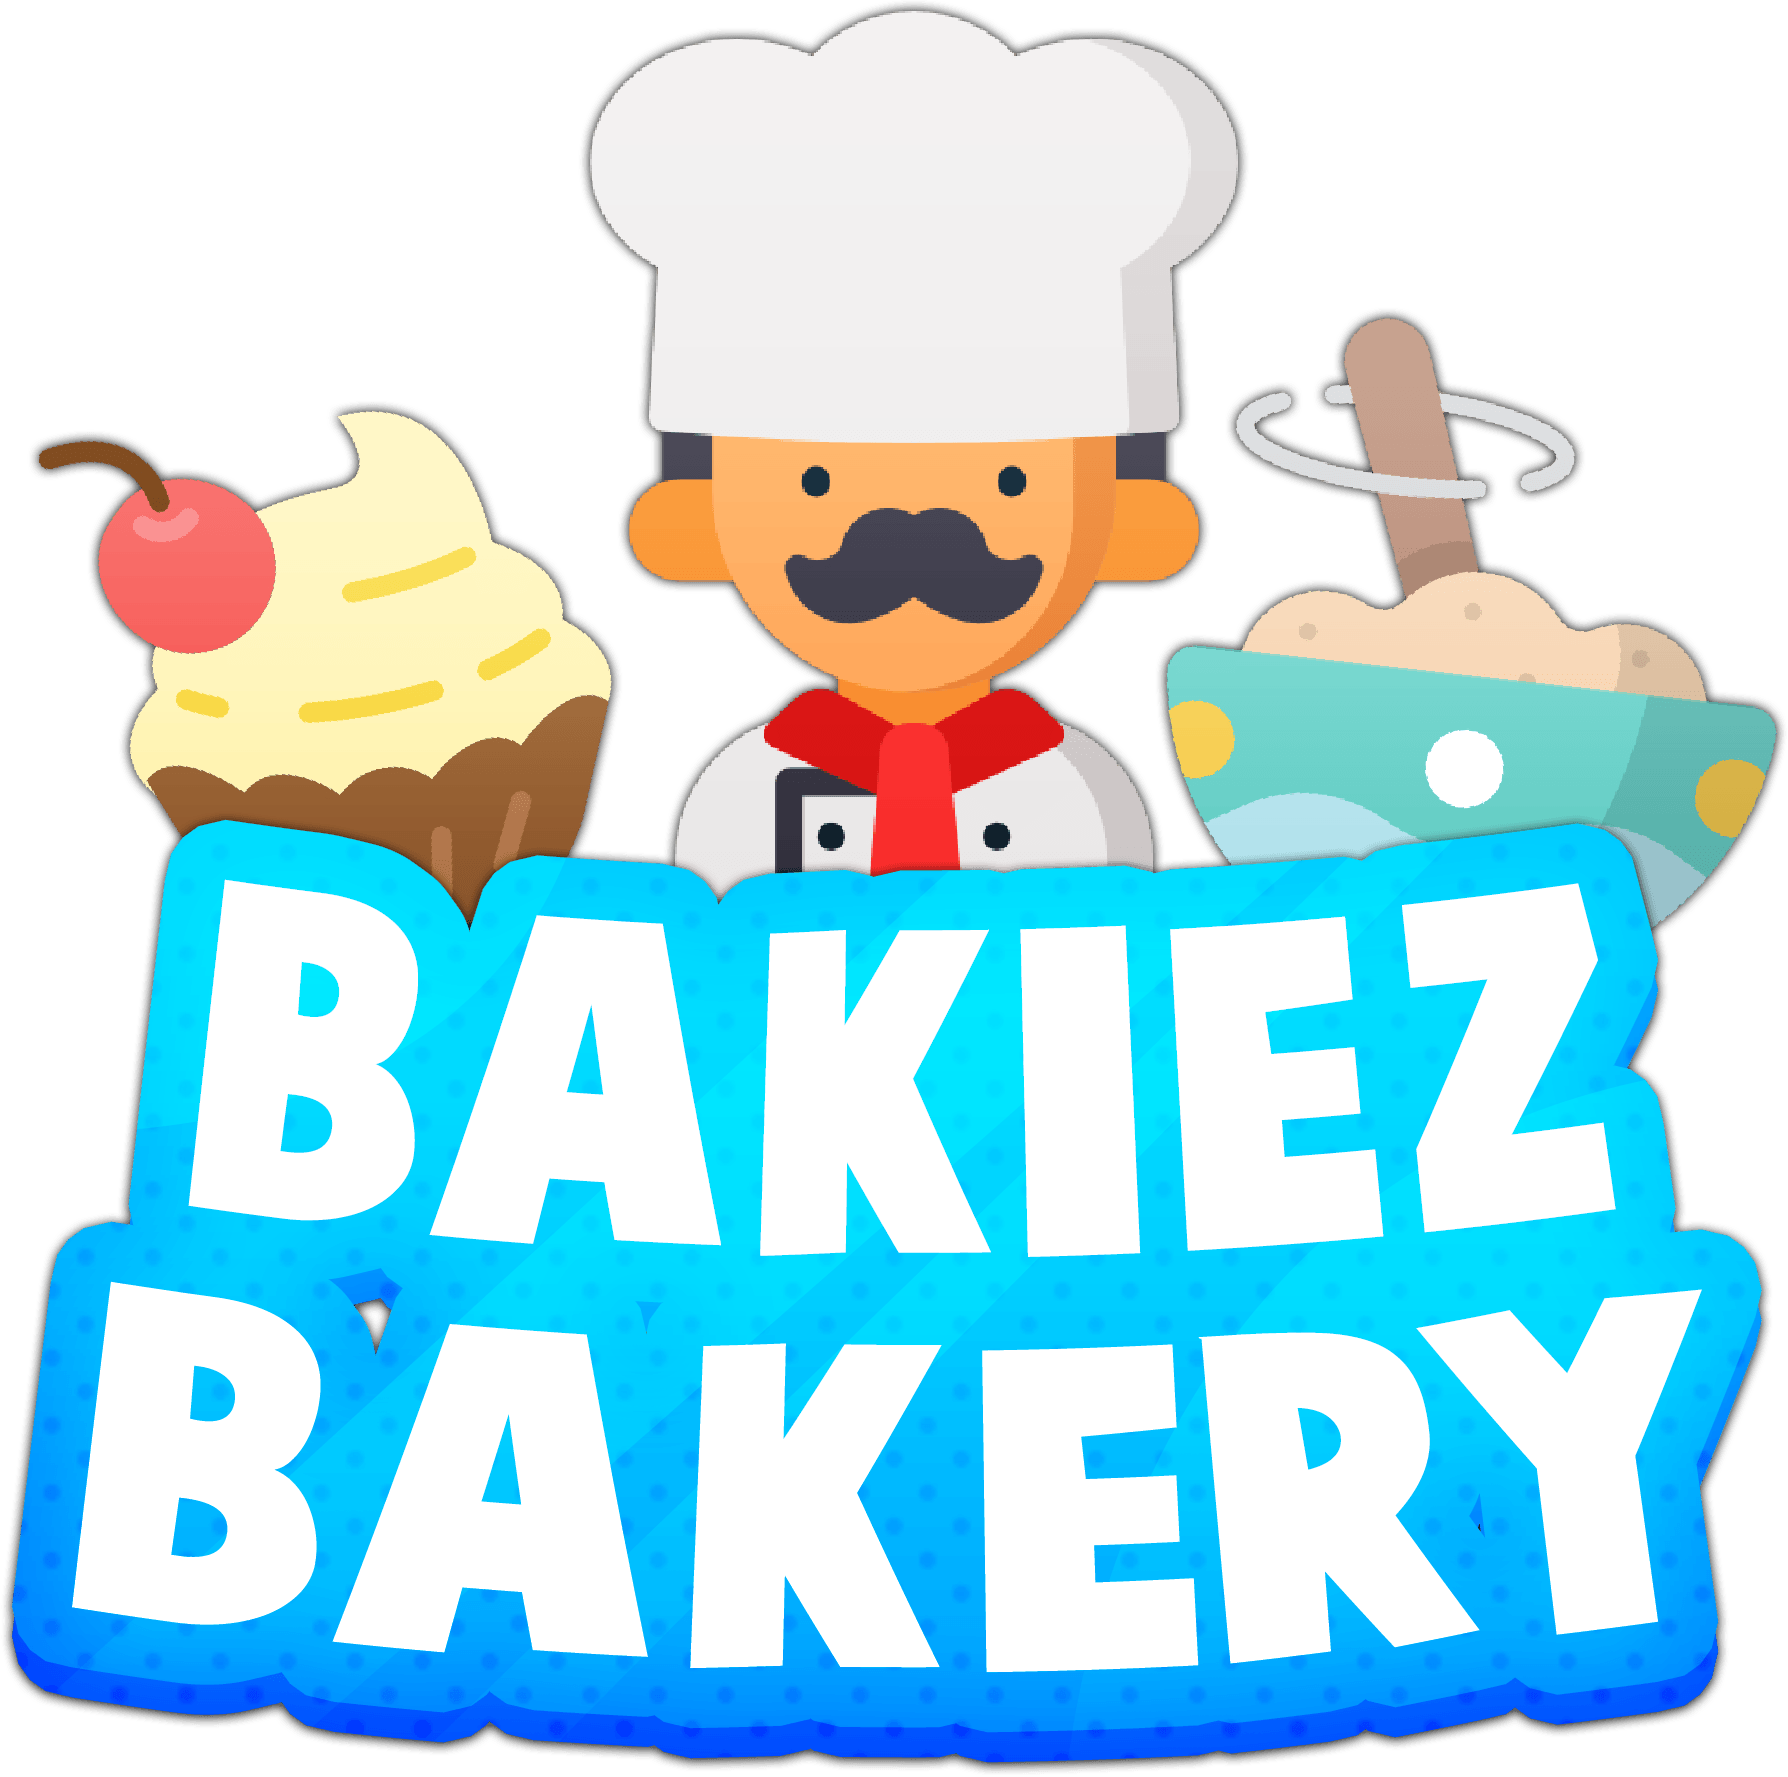 Bakiez Bakery Fun Quiz Quizizz